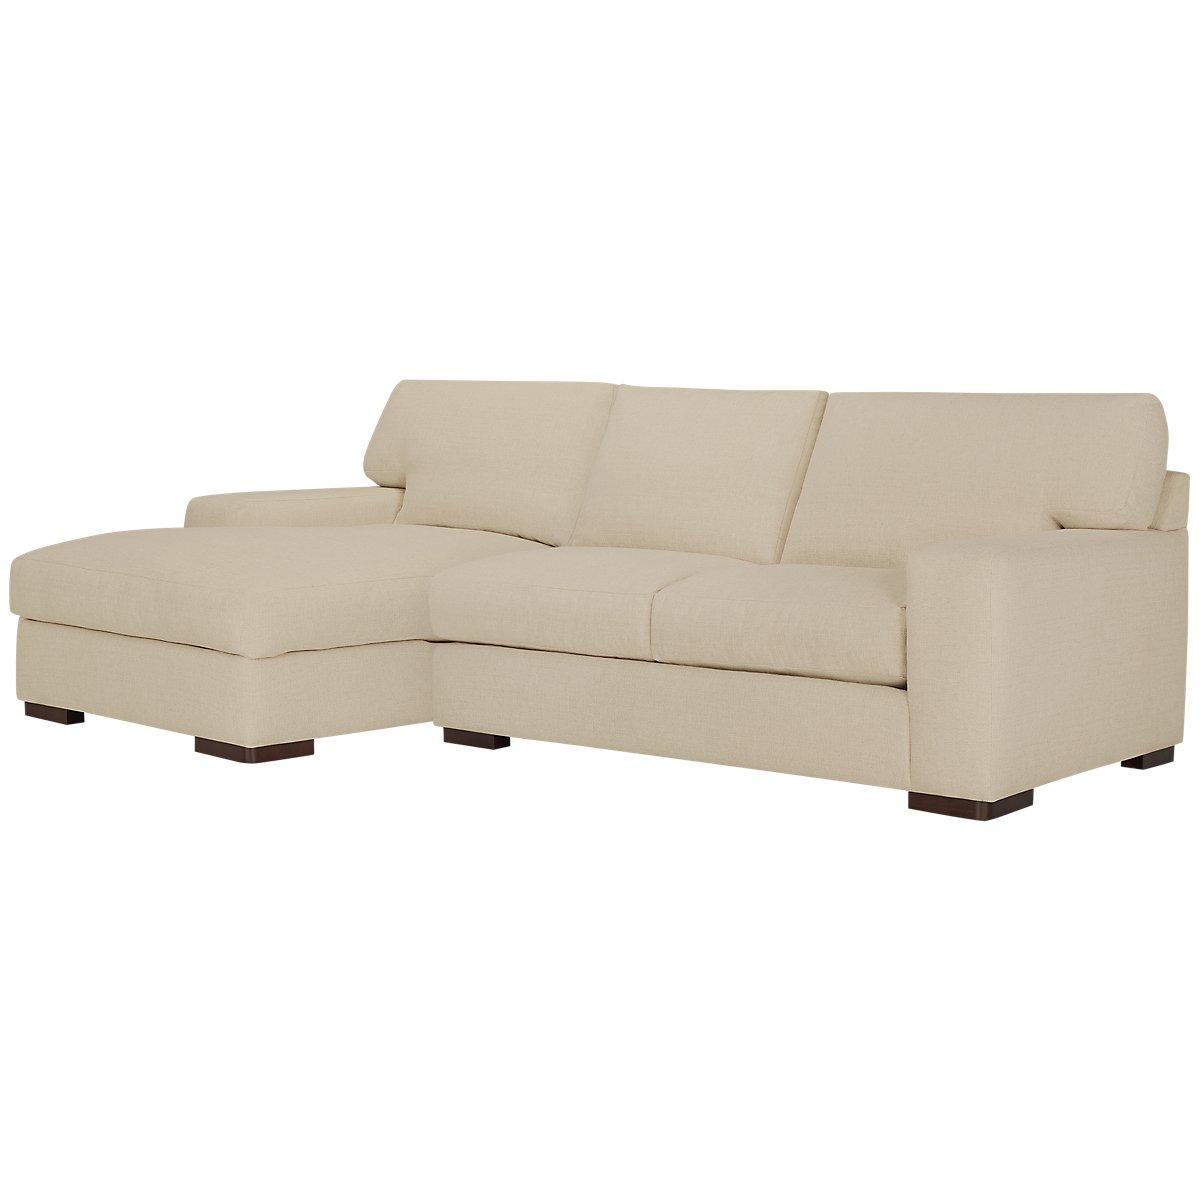 City furniture veronica khaki down left chaise sectional for Chaise kaki